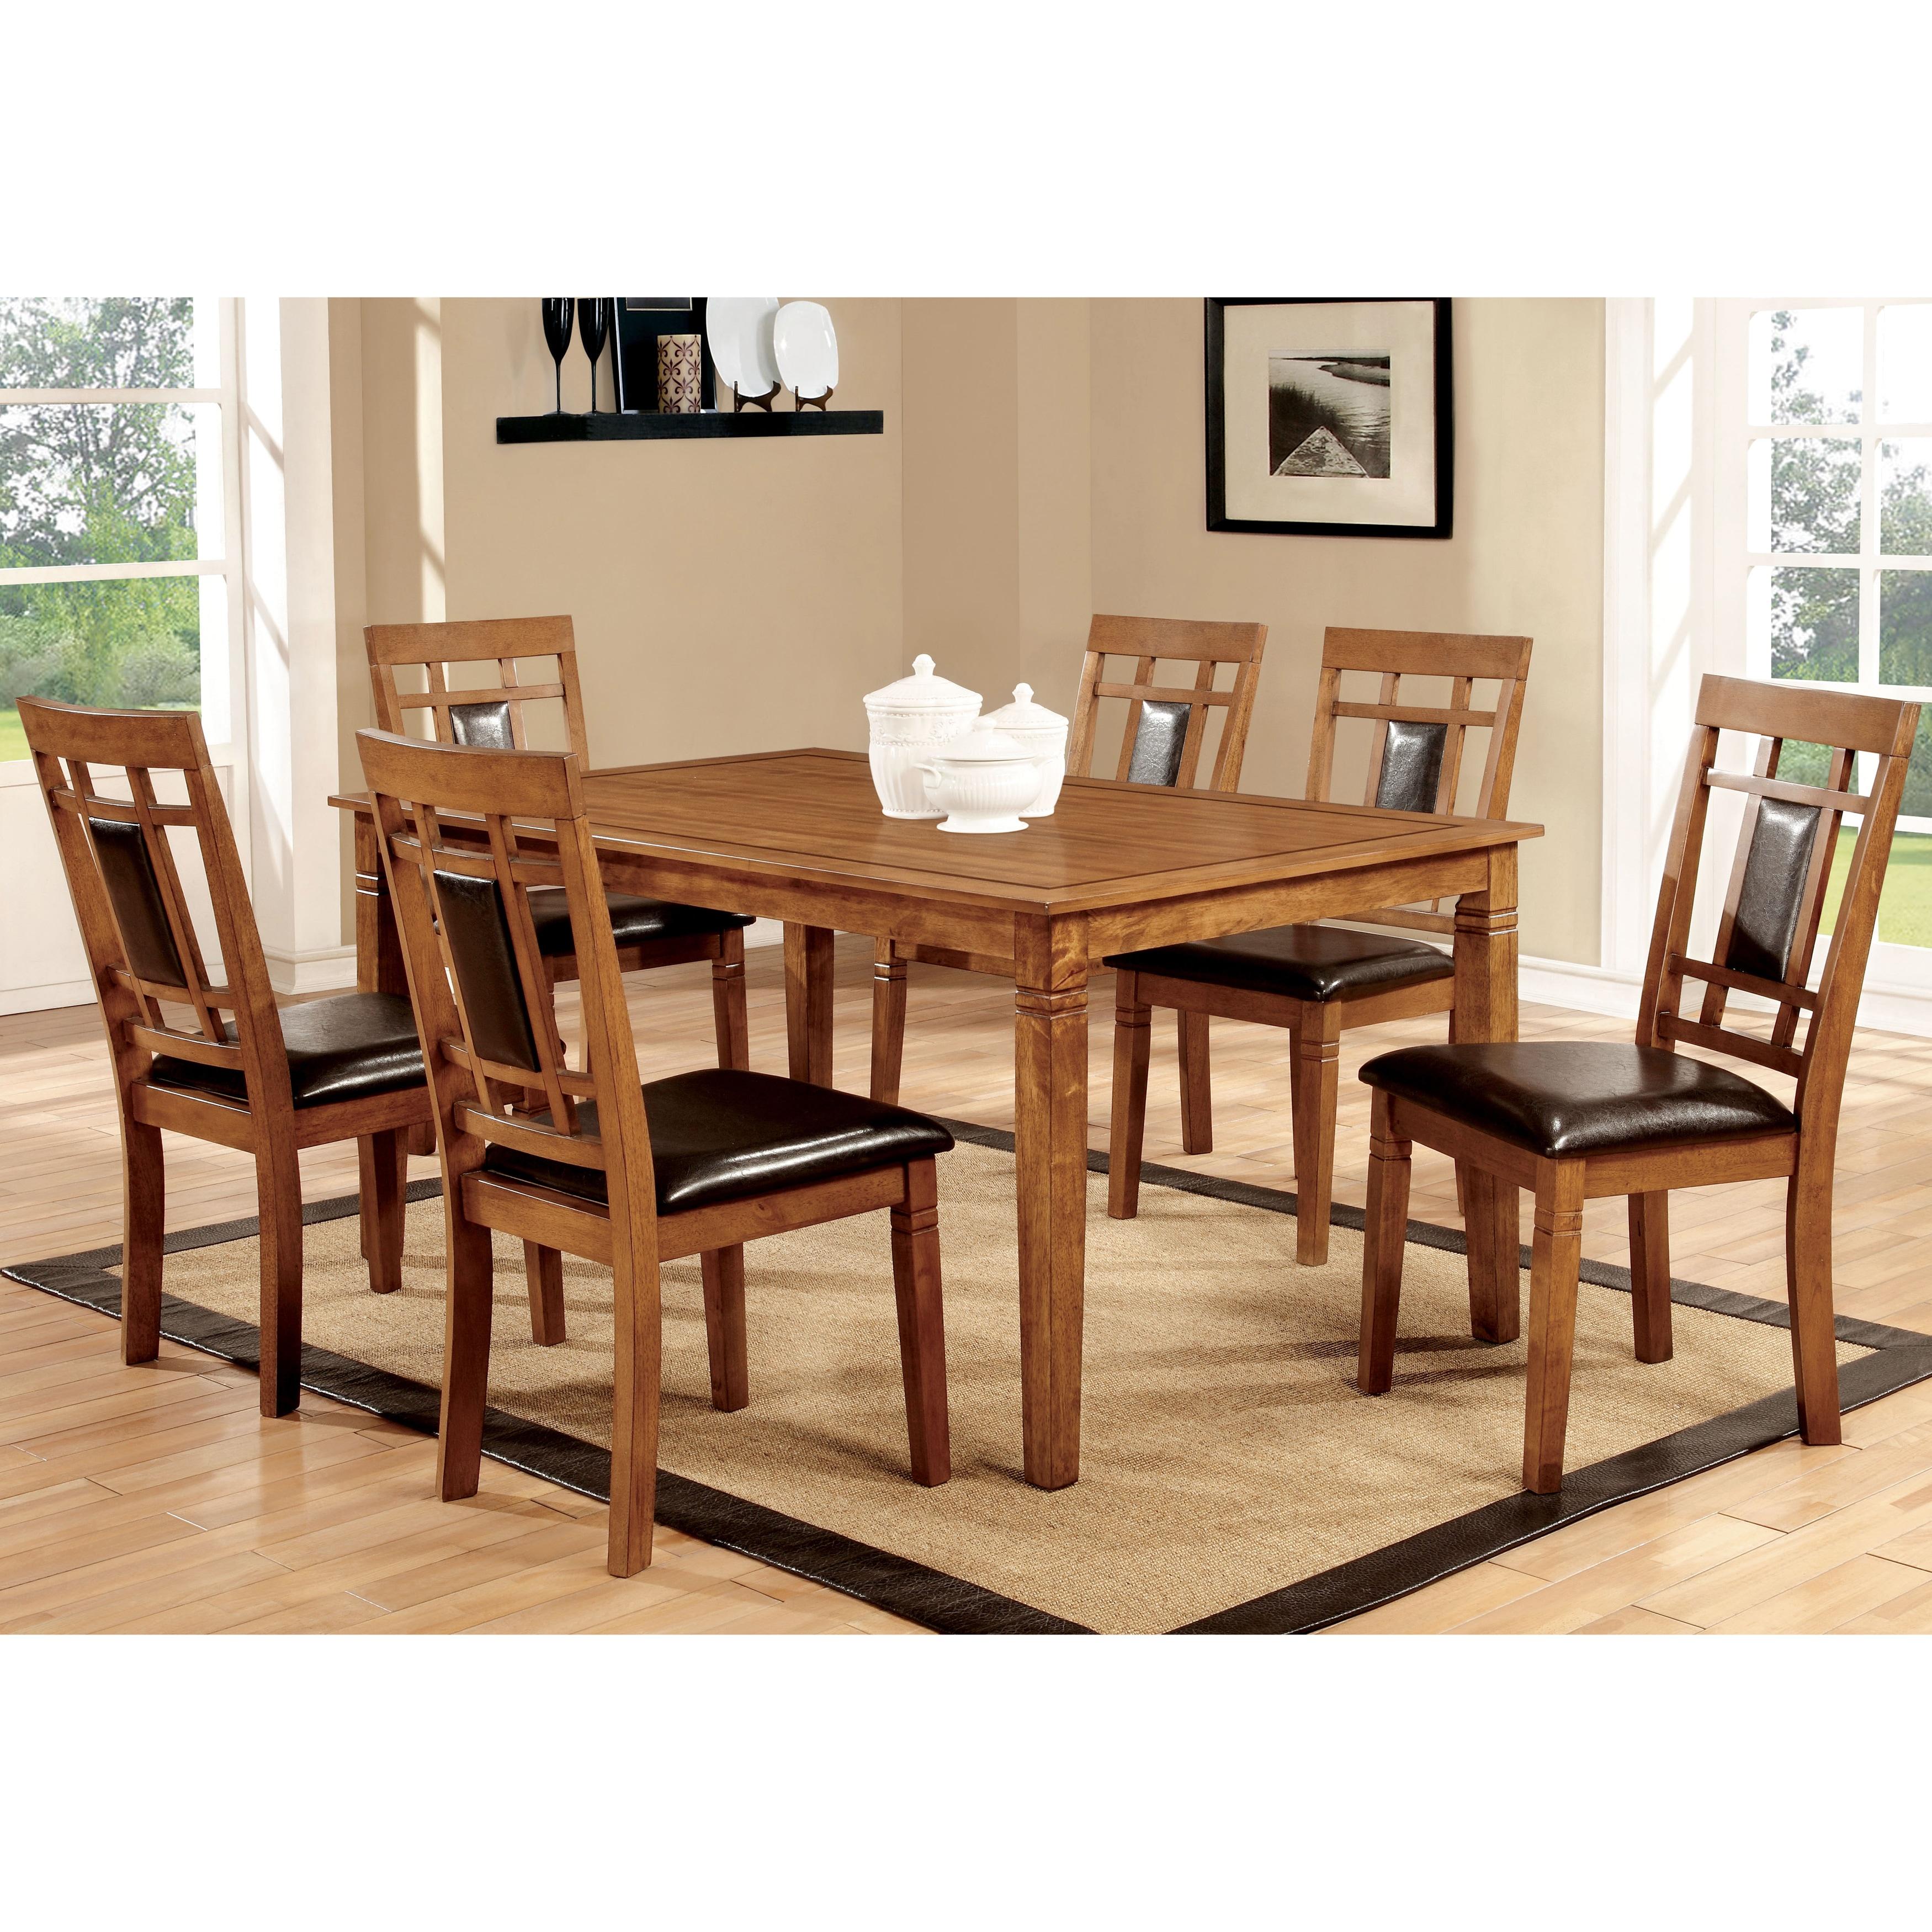 Furniture of America Bennett 7-piece Light Oak Dining Set...